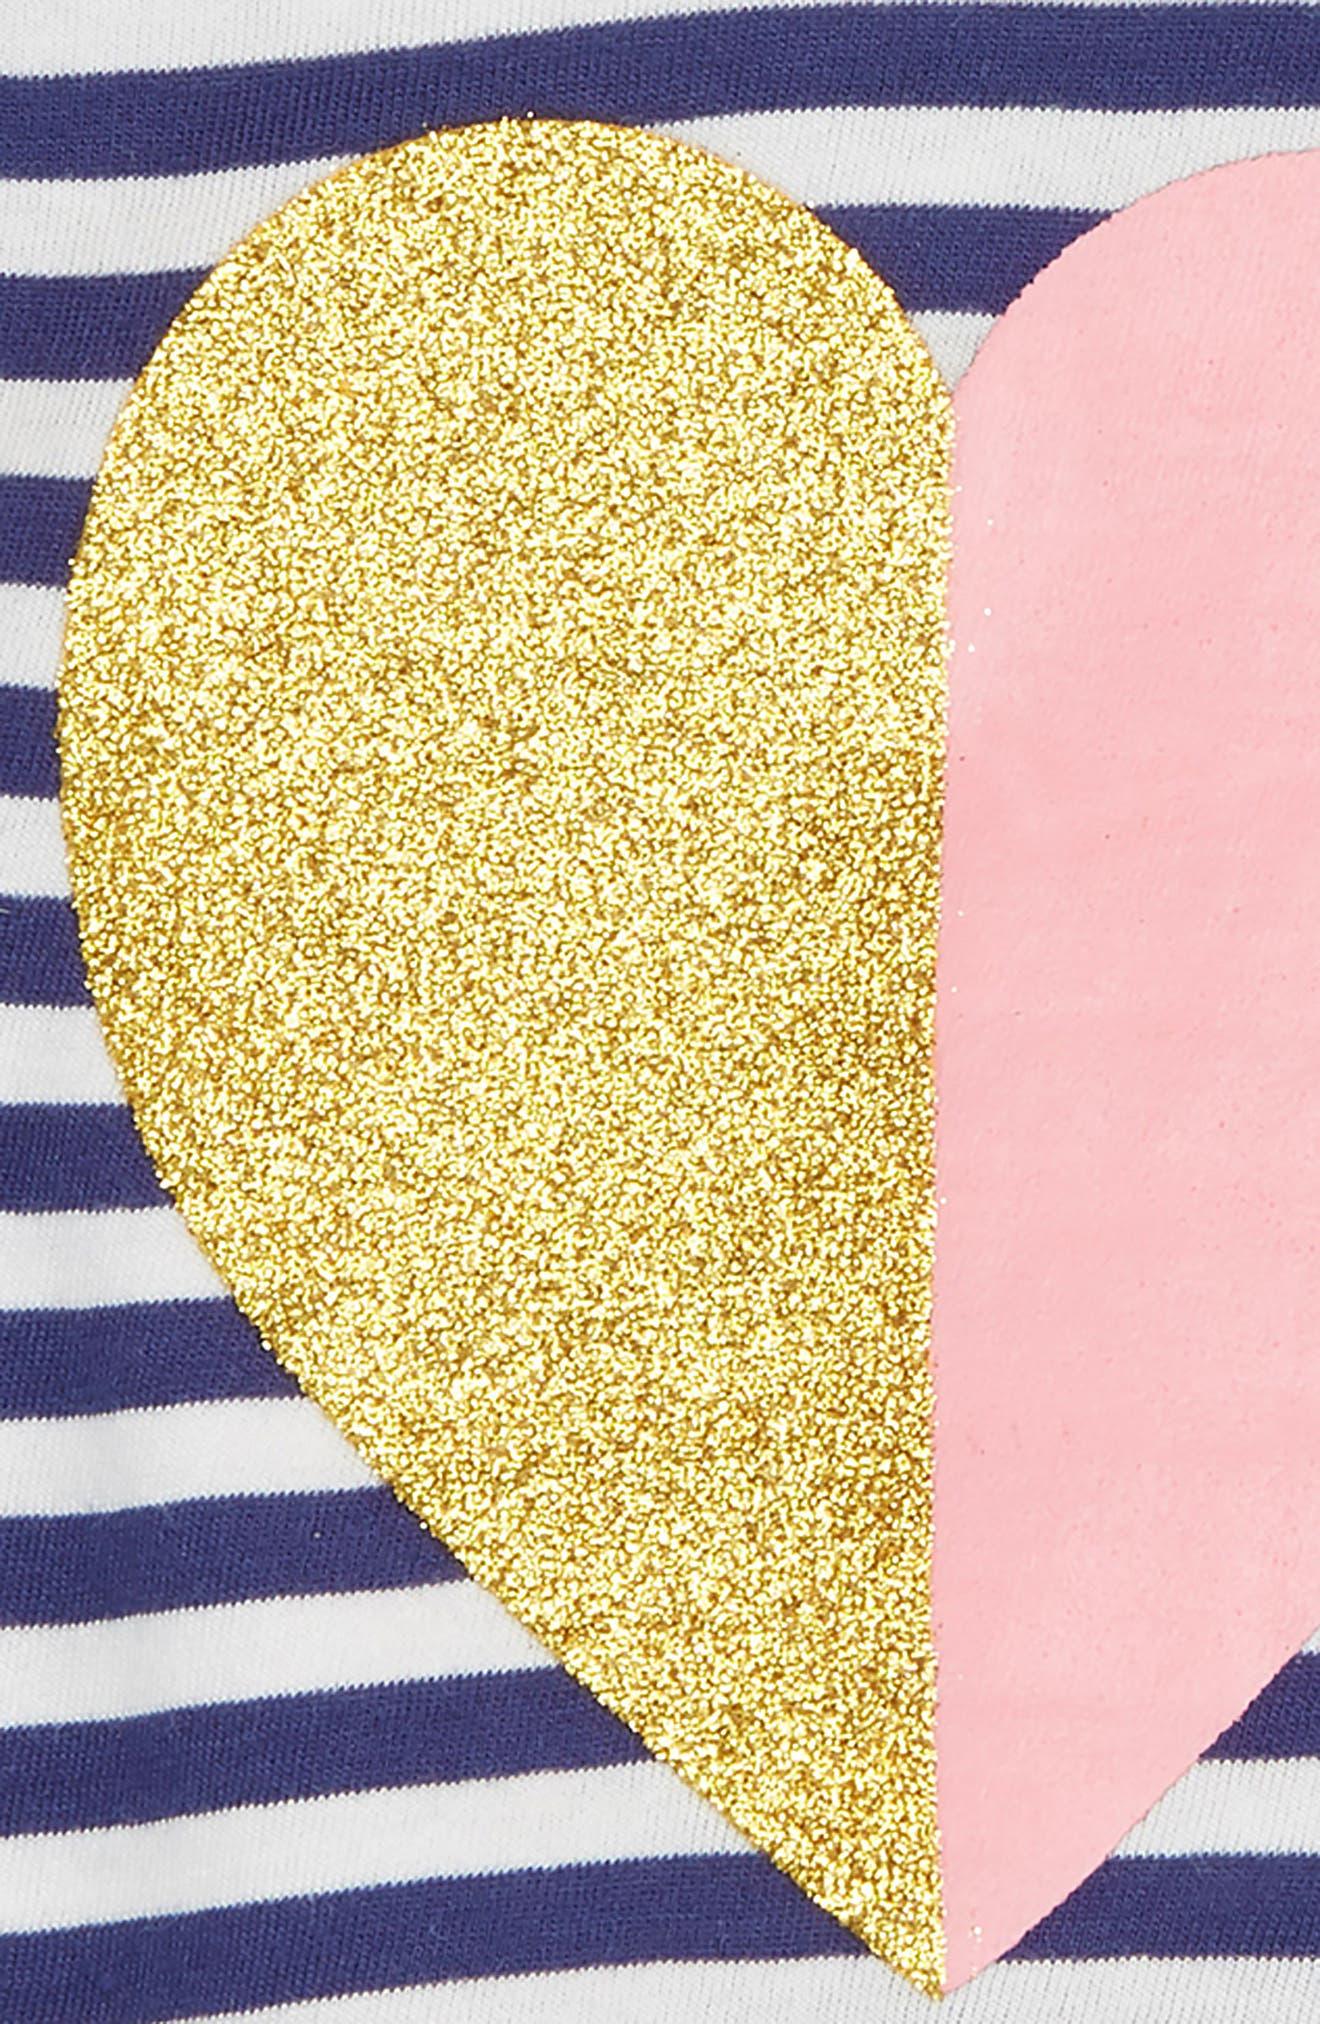 Stripe Peplum Graphic Top,                             Alternate thumbnail 2, color,                             Navy Ribbon Sparkle Heart